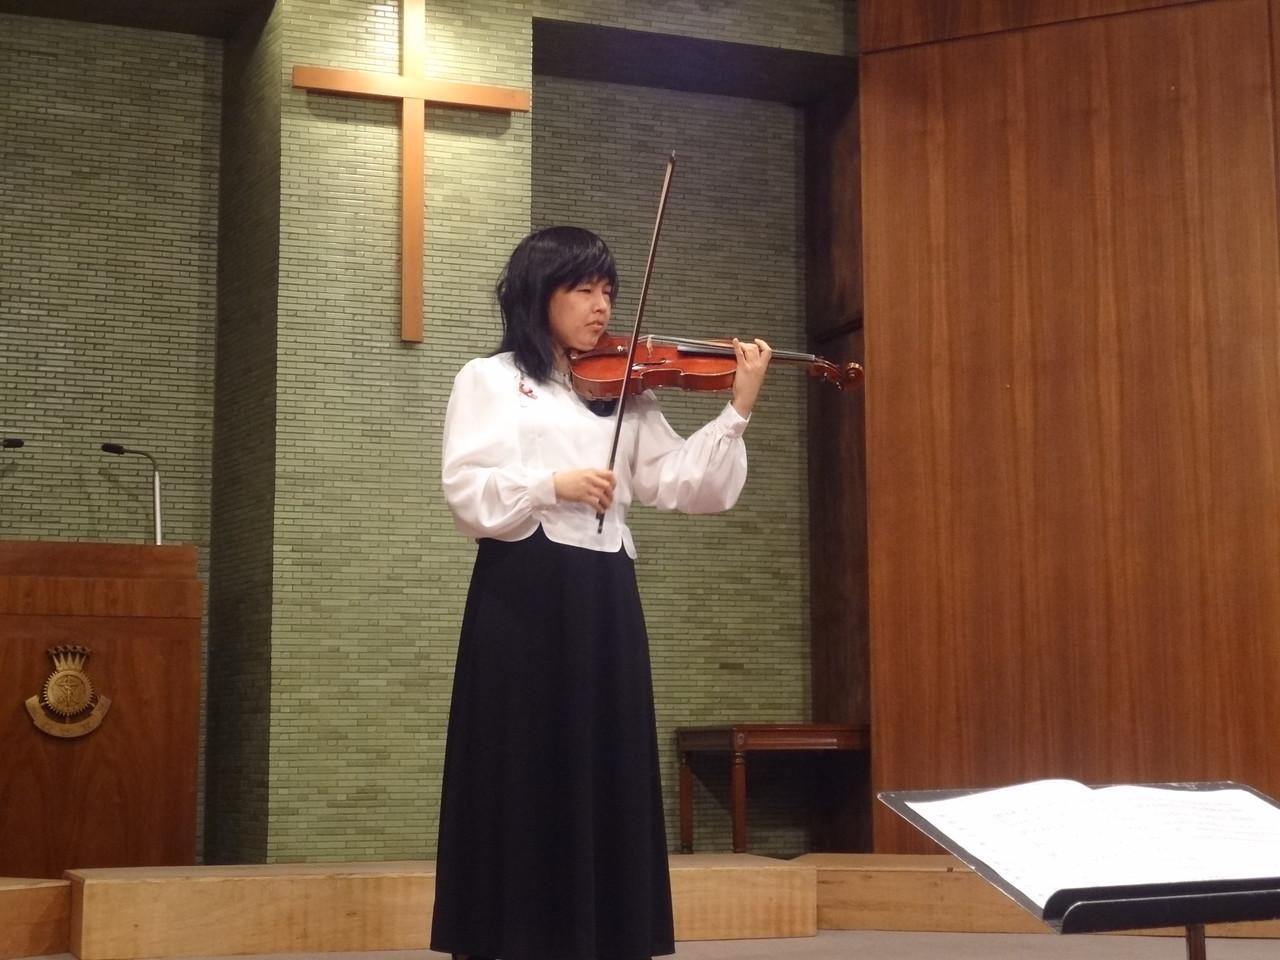 荒木唯子さんのヴァイオリン演奏。